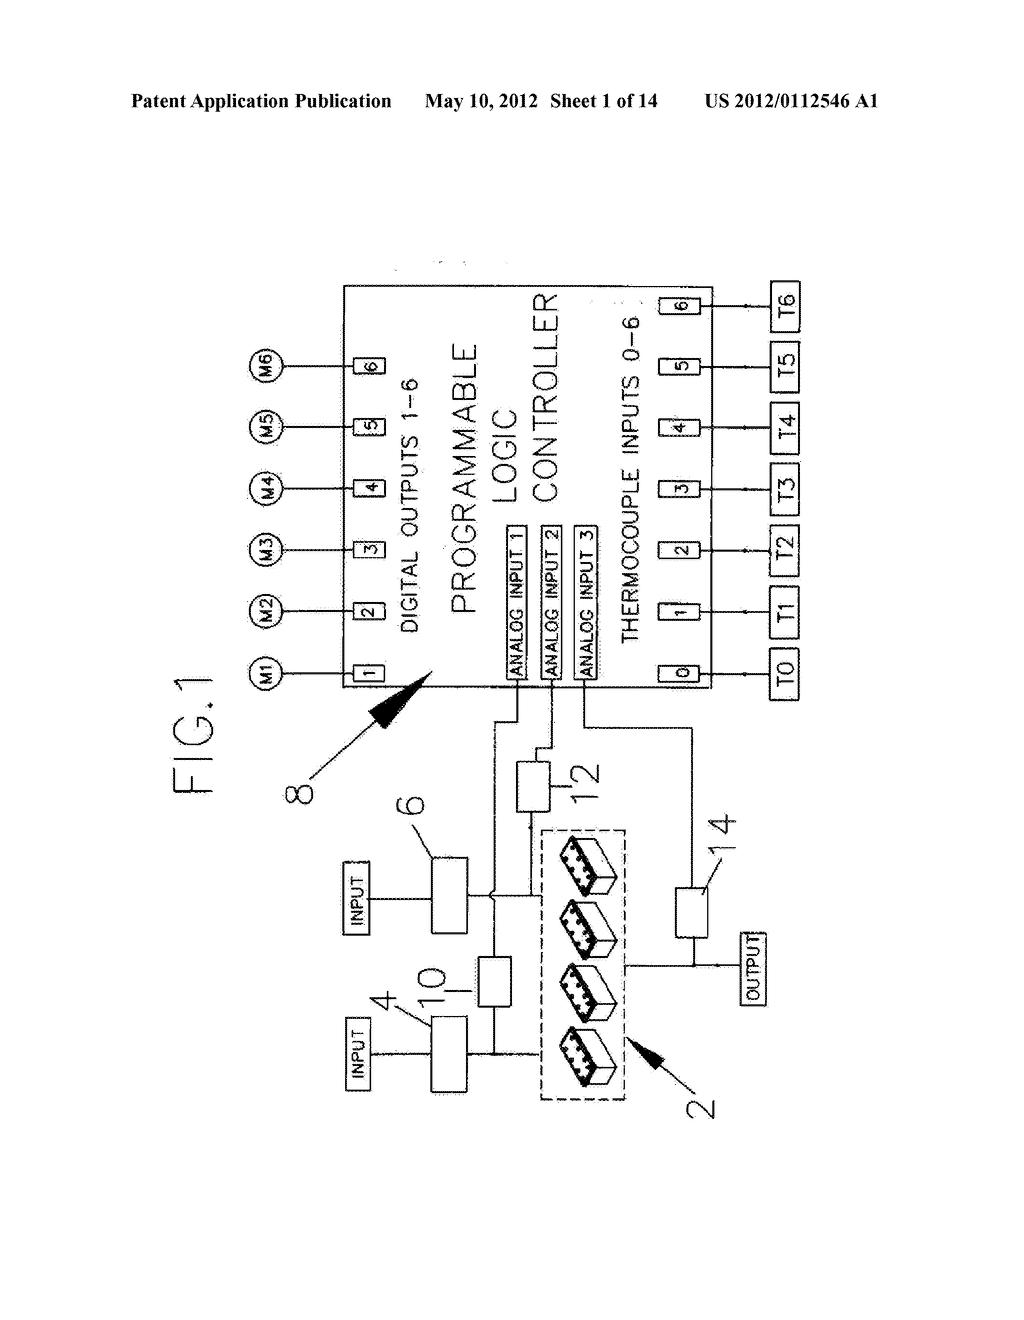 Thermon Tc 1818a Wiring Diagram Thermon Heat Trace Control